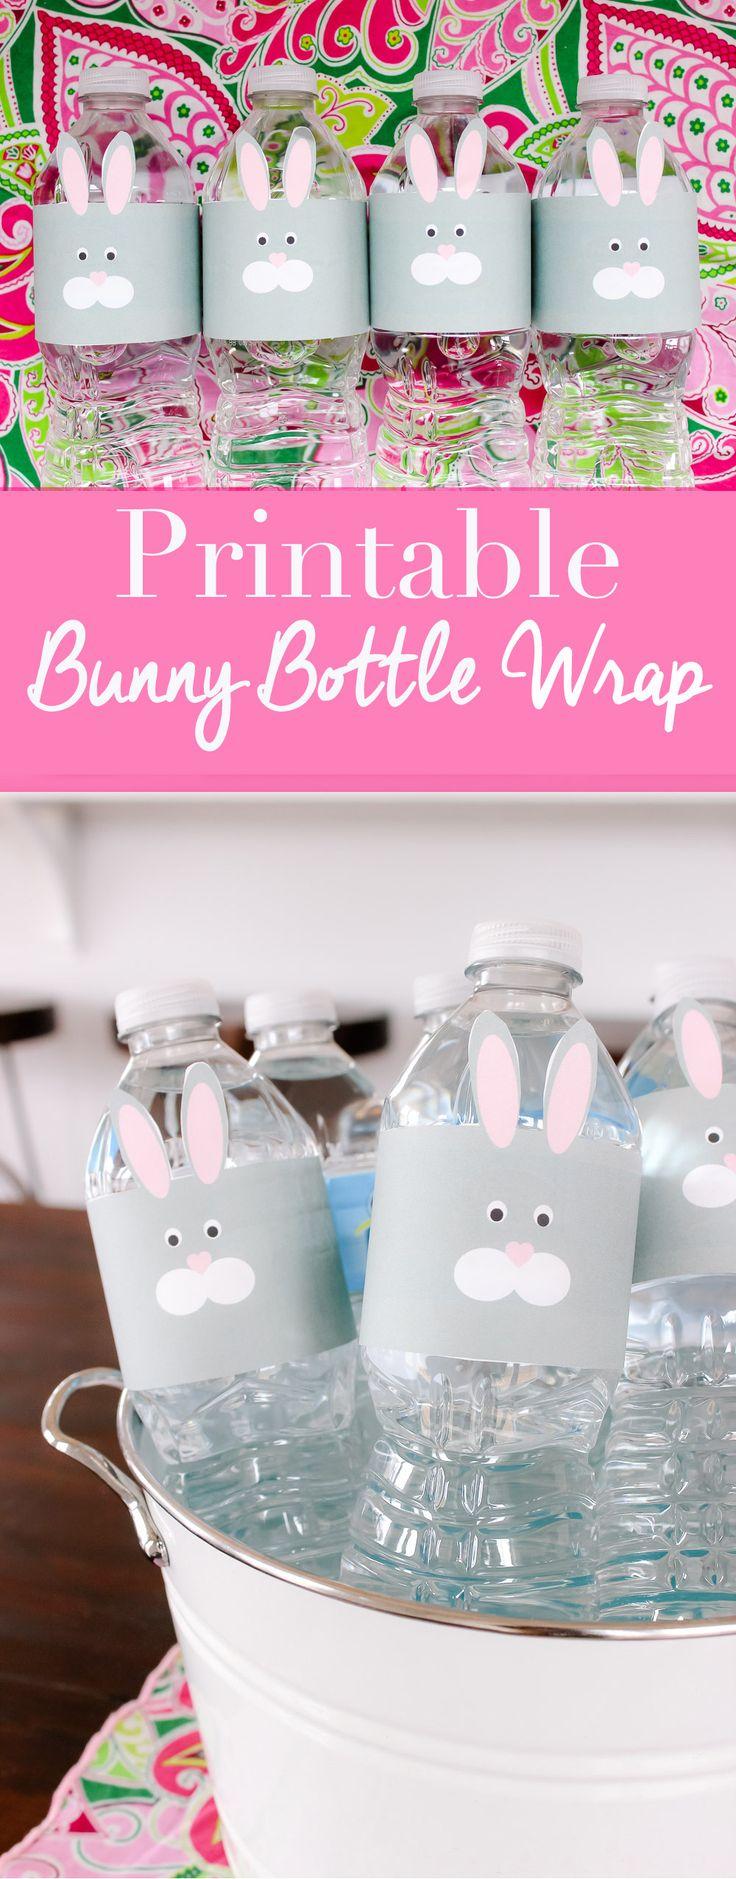 Bunny Bottle Wraps - Easter party - bottle wraps - diy #PureLife40PK #ad